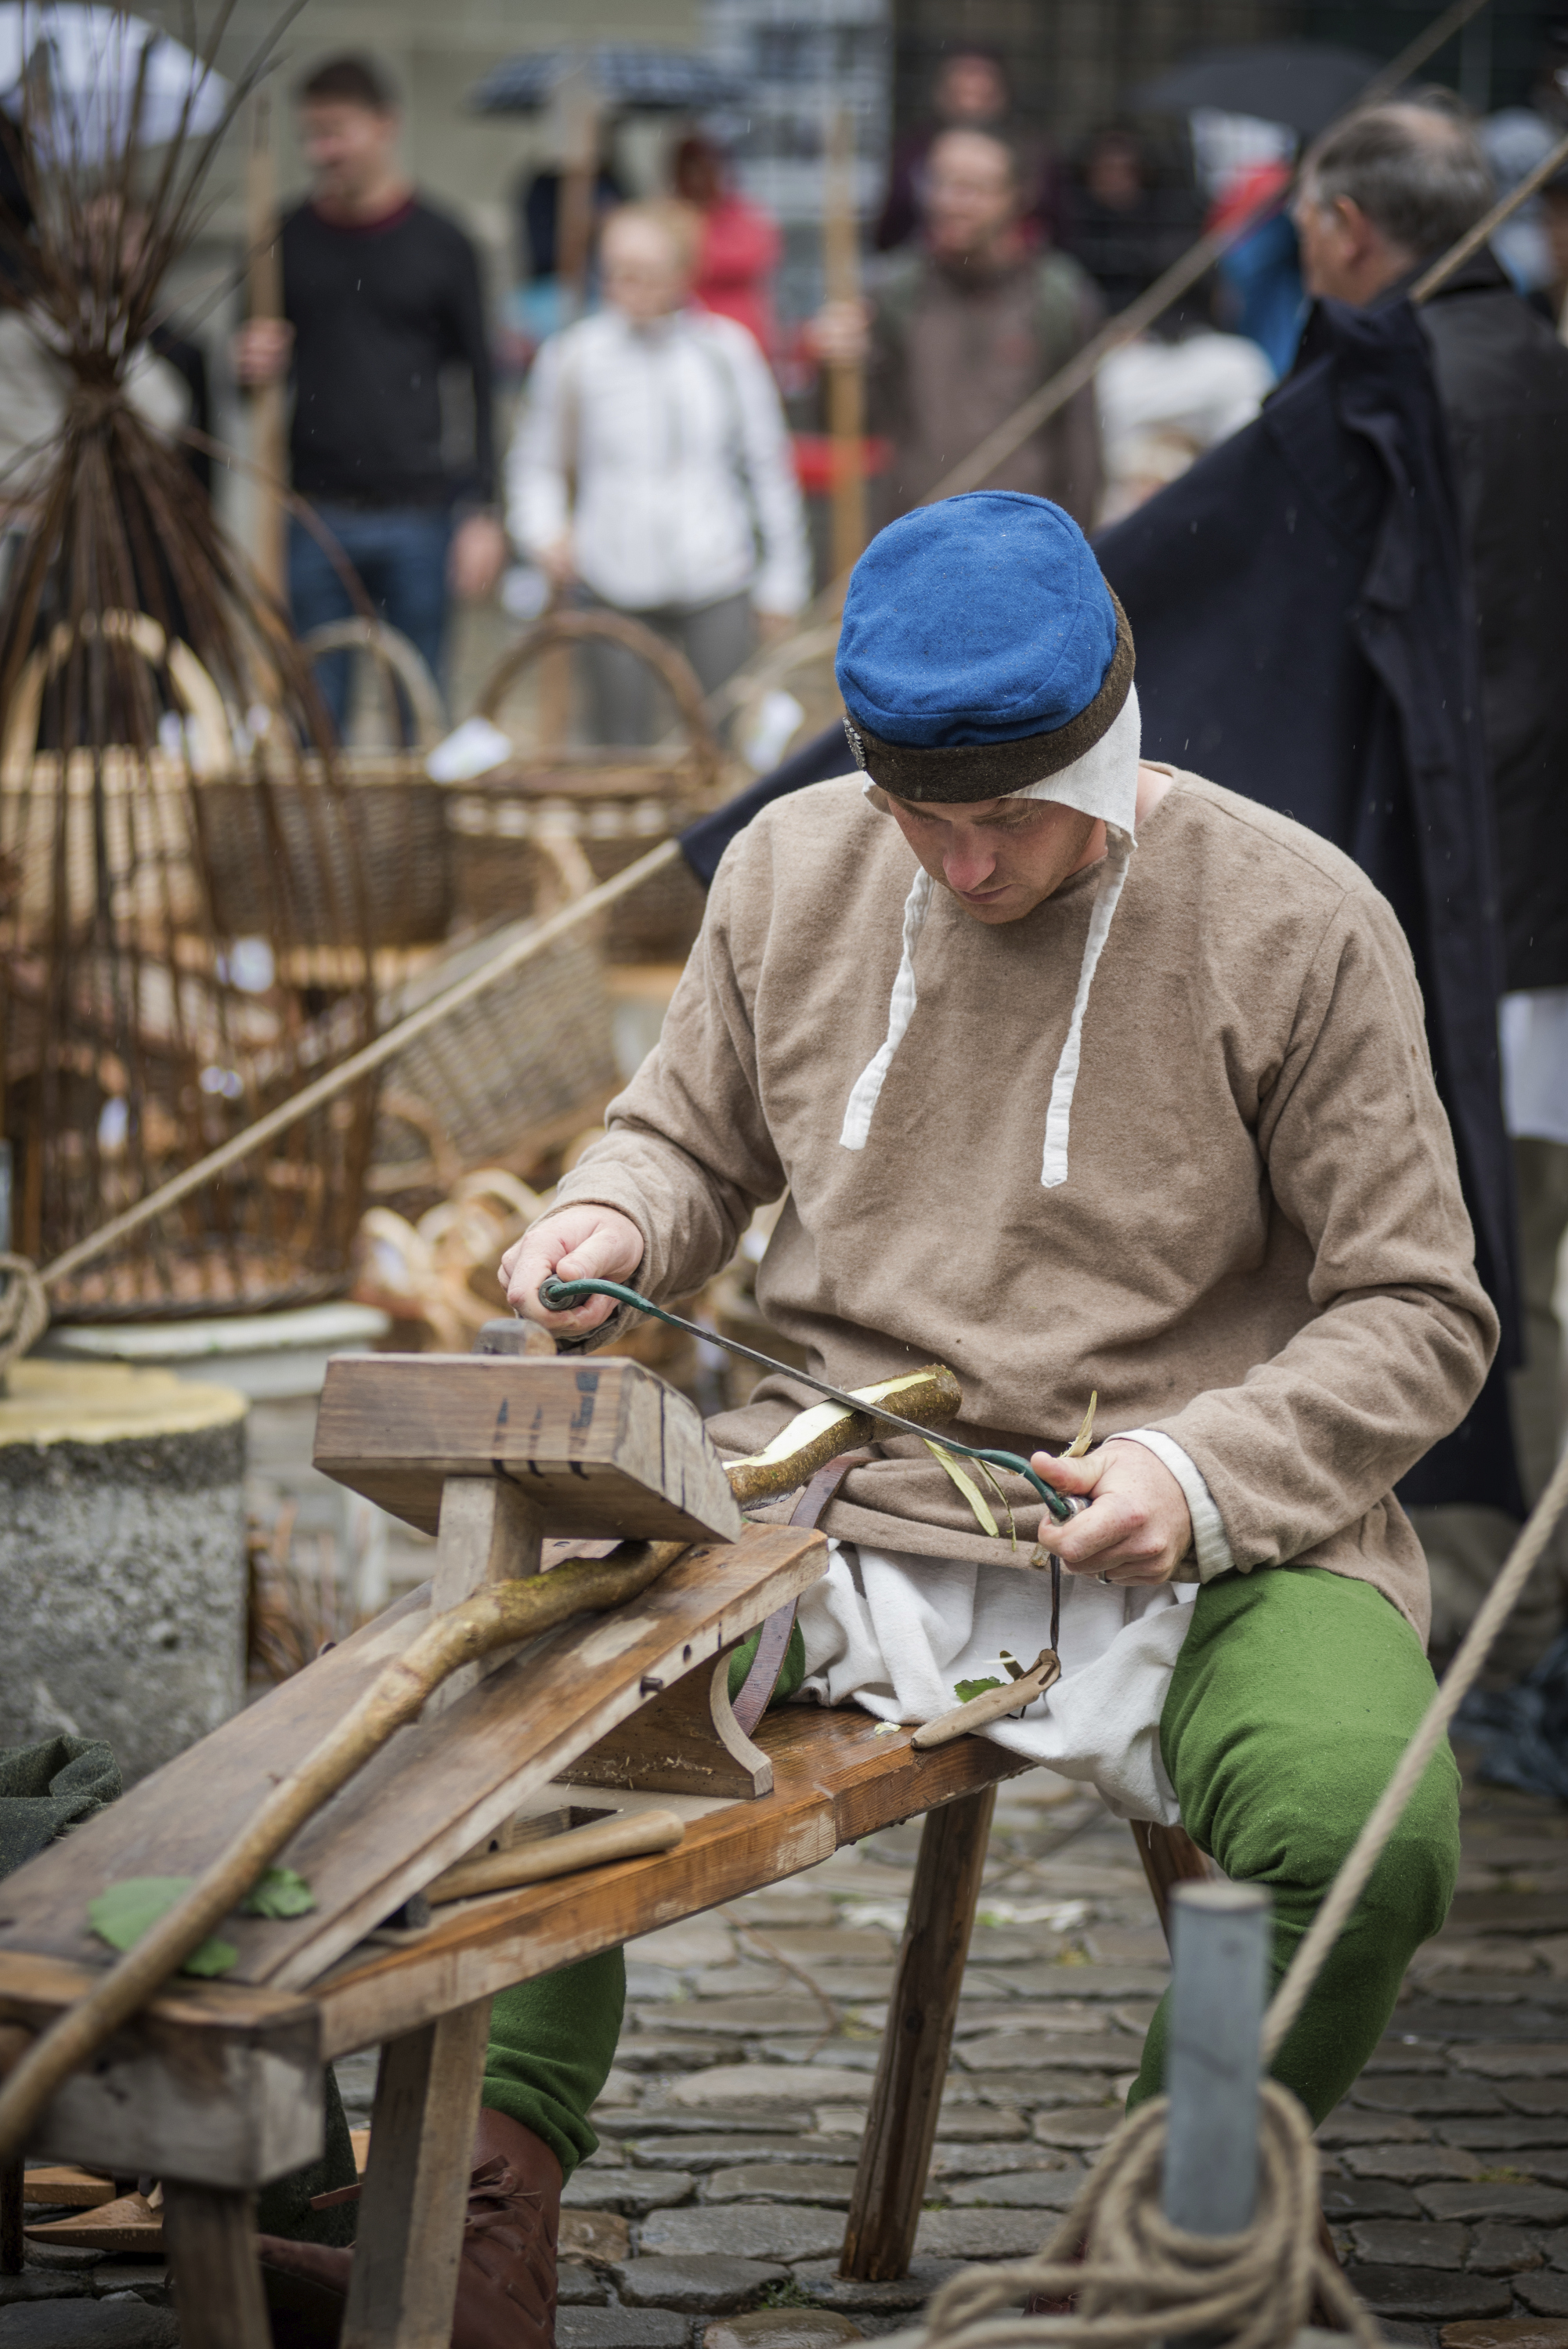 Löffelschnitzer am Schnitzbock